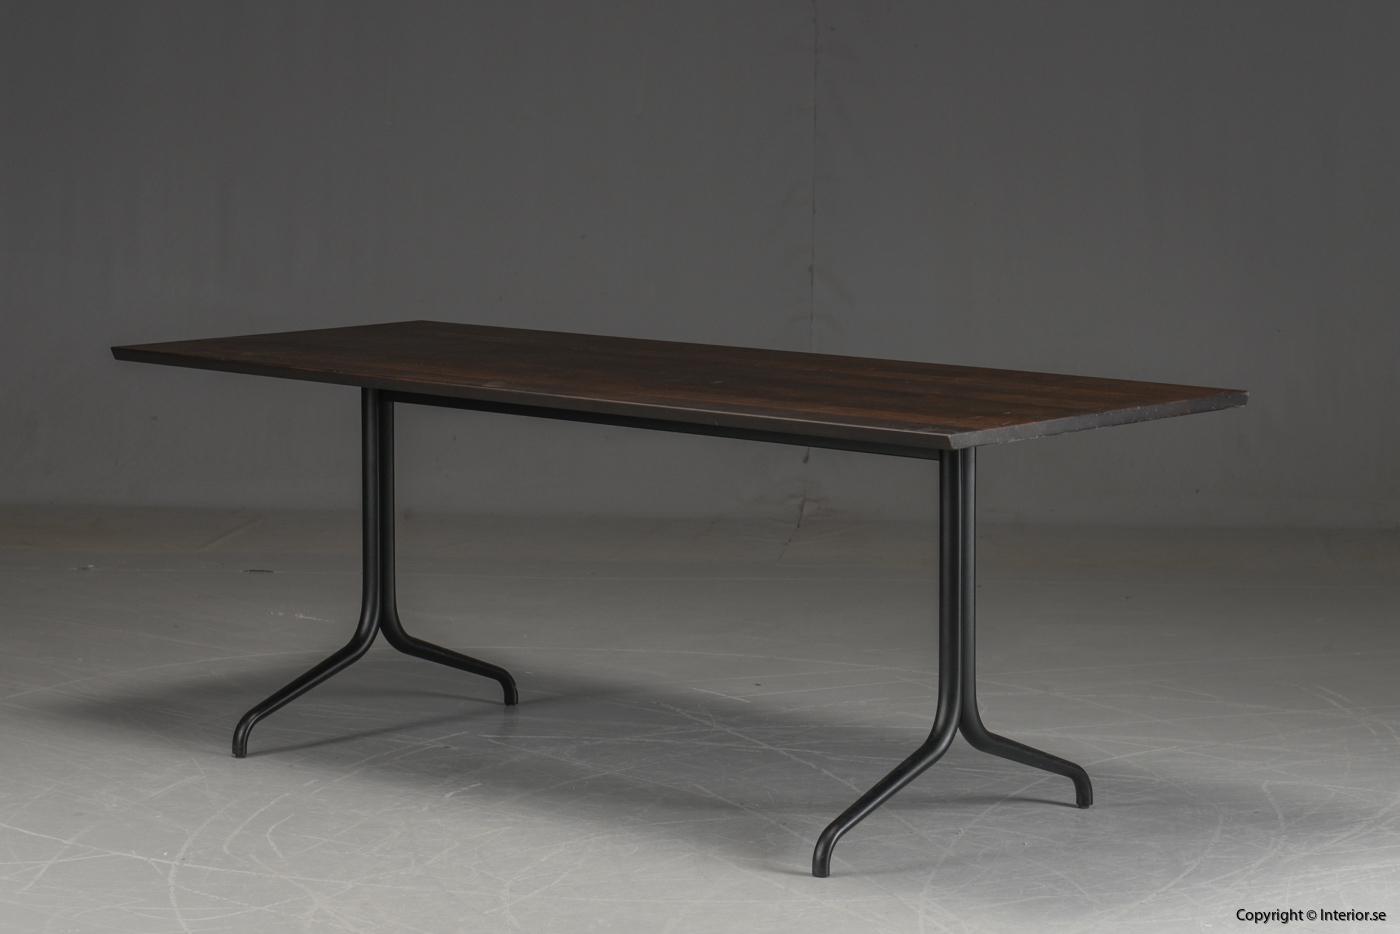 Konferensbord, Vitra Belleville Table - Ronan & Erwan Bouroullec